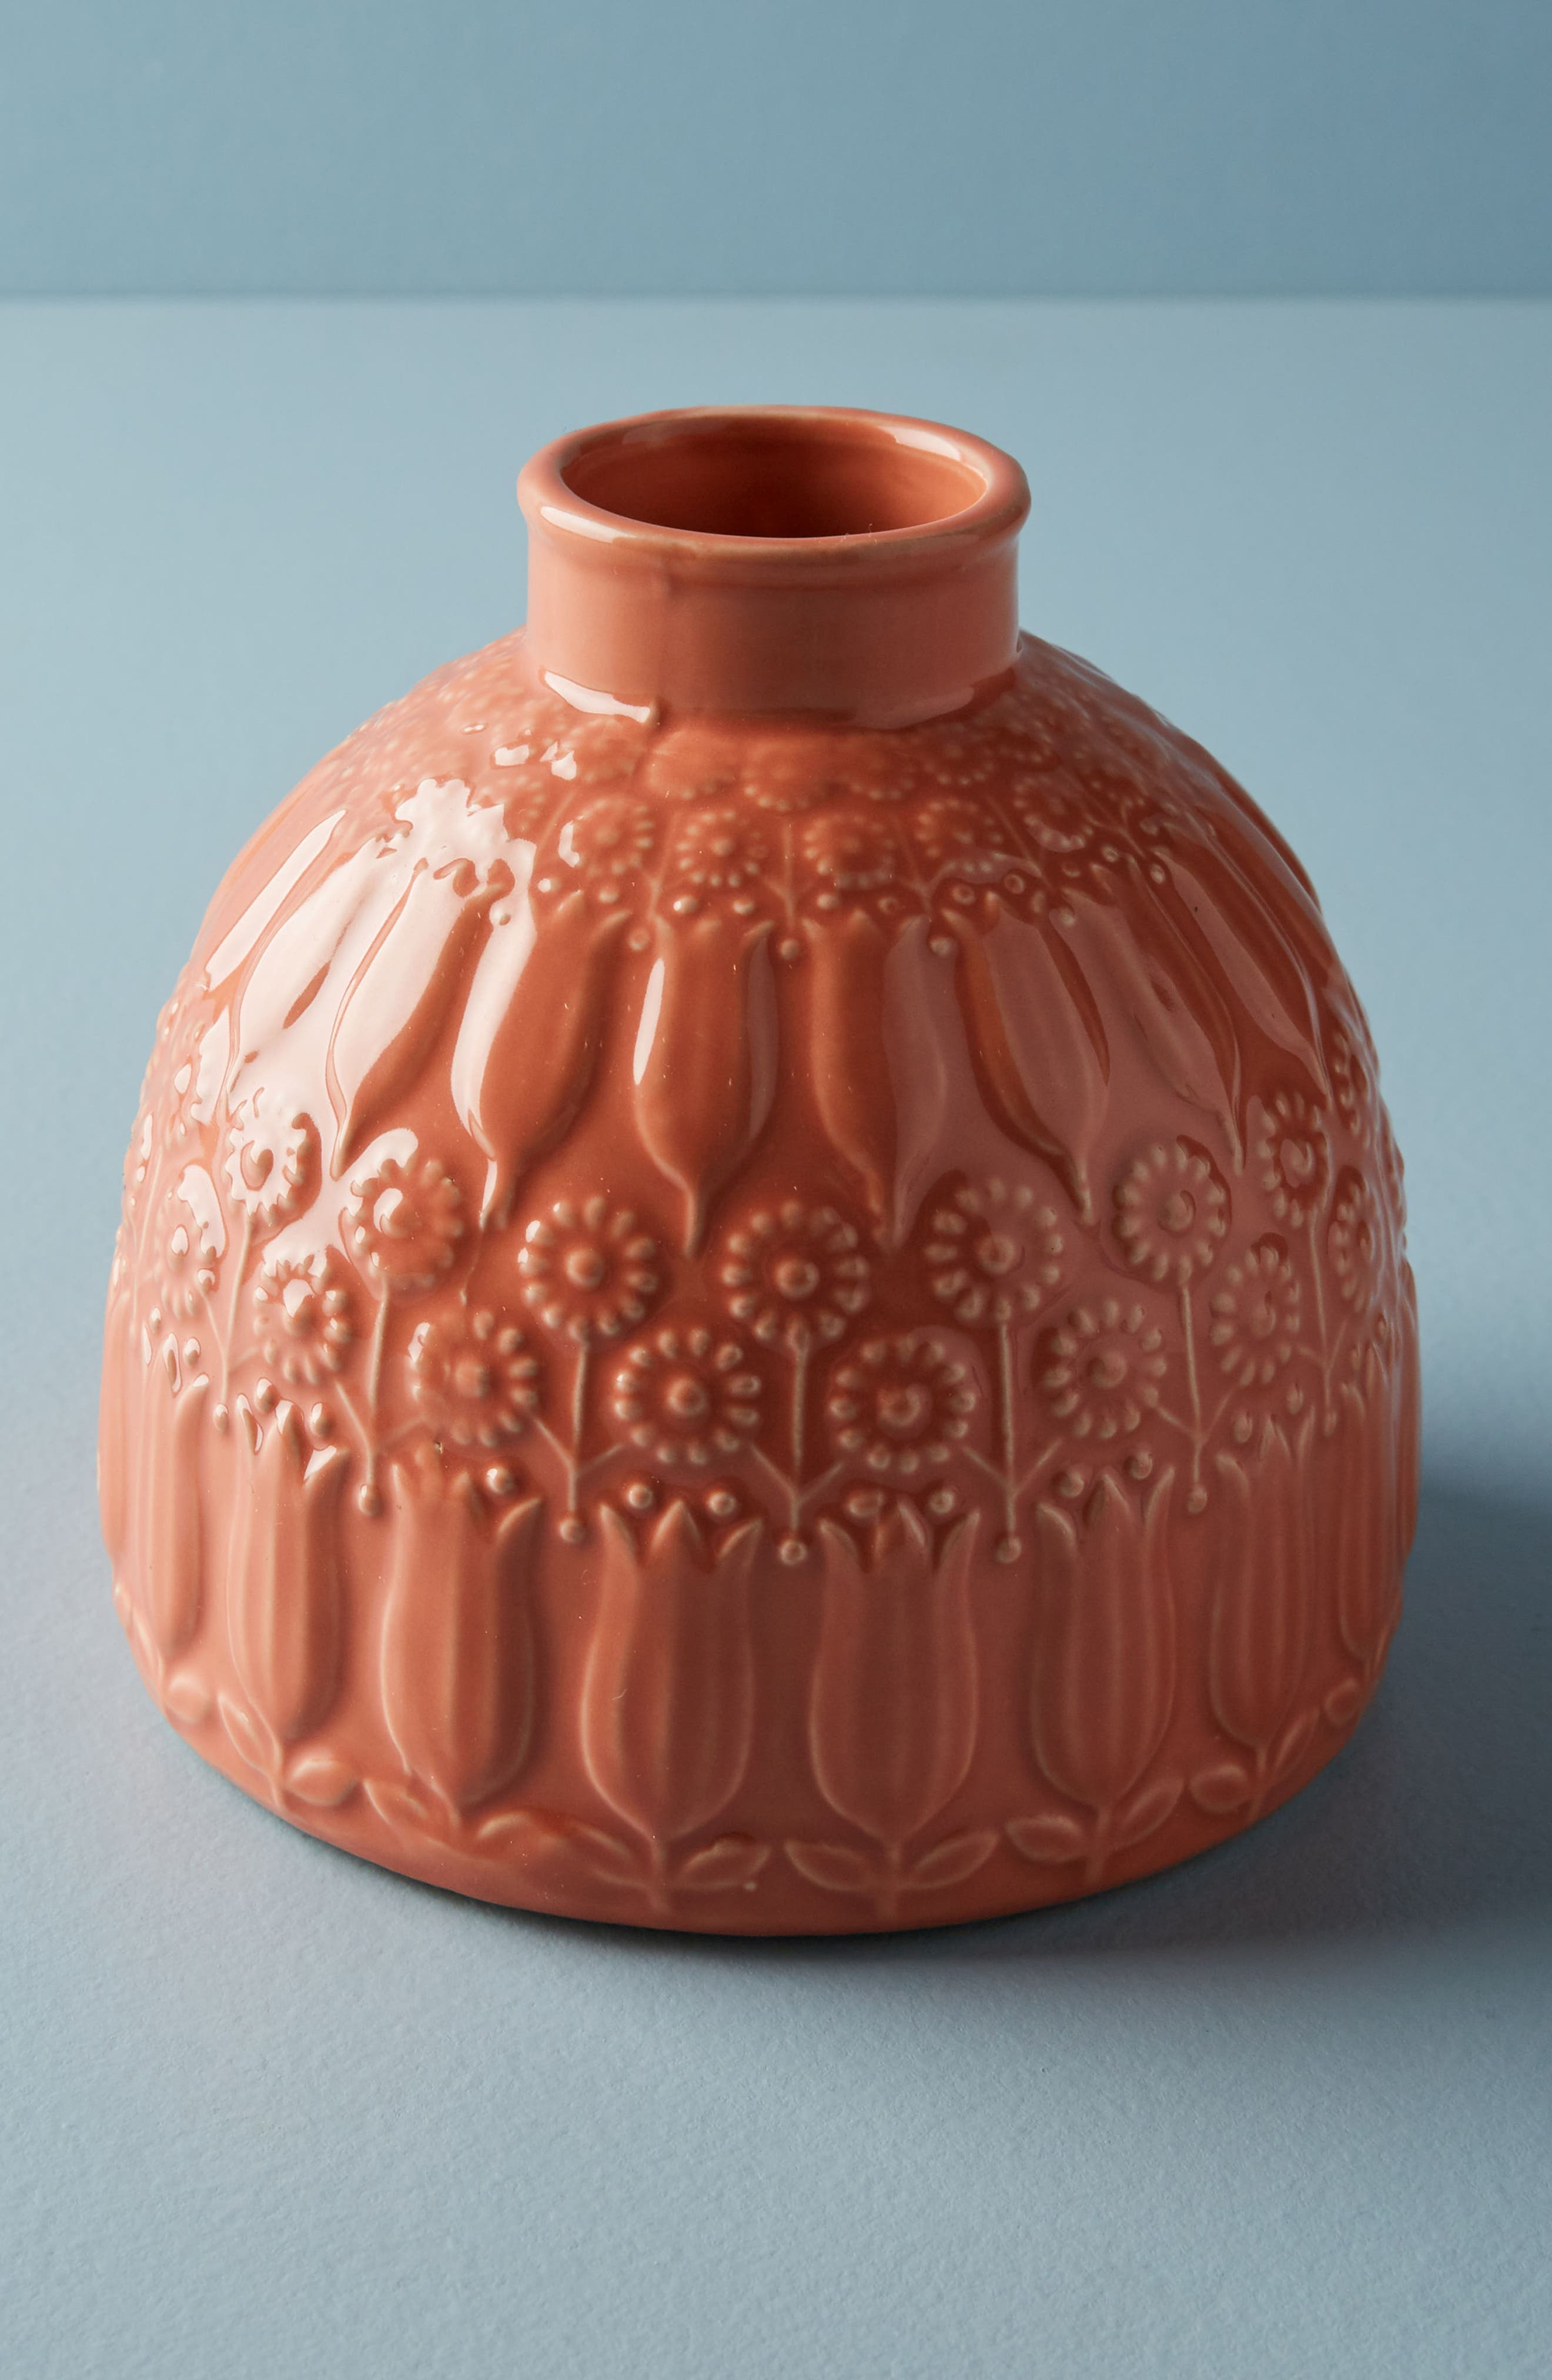 Anthropologie Embossed Floral Vase